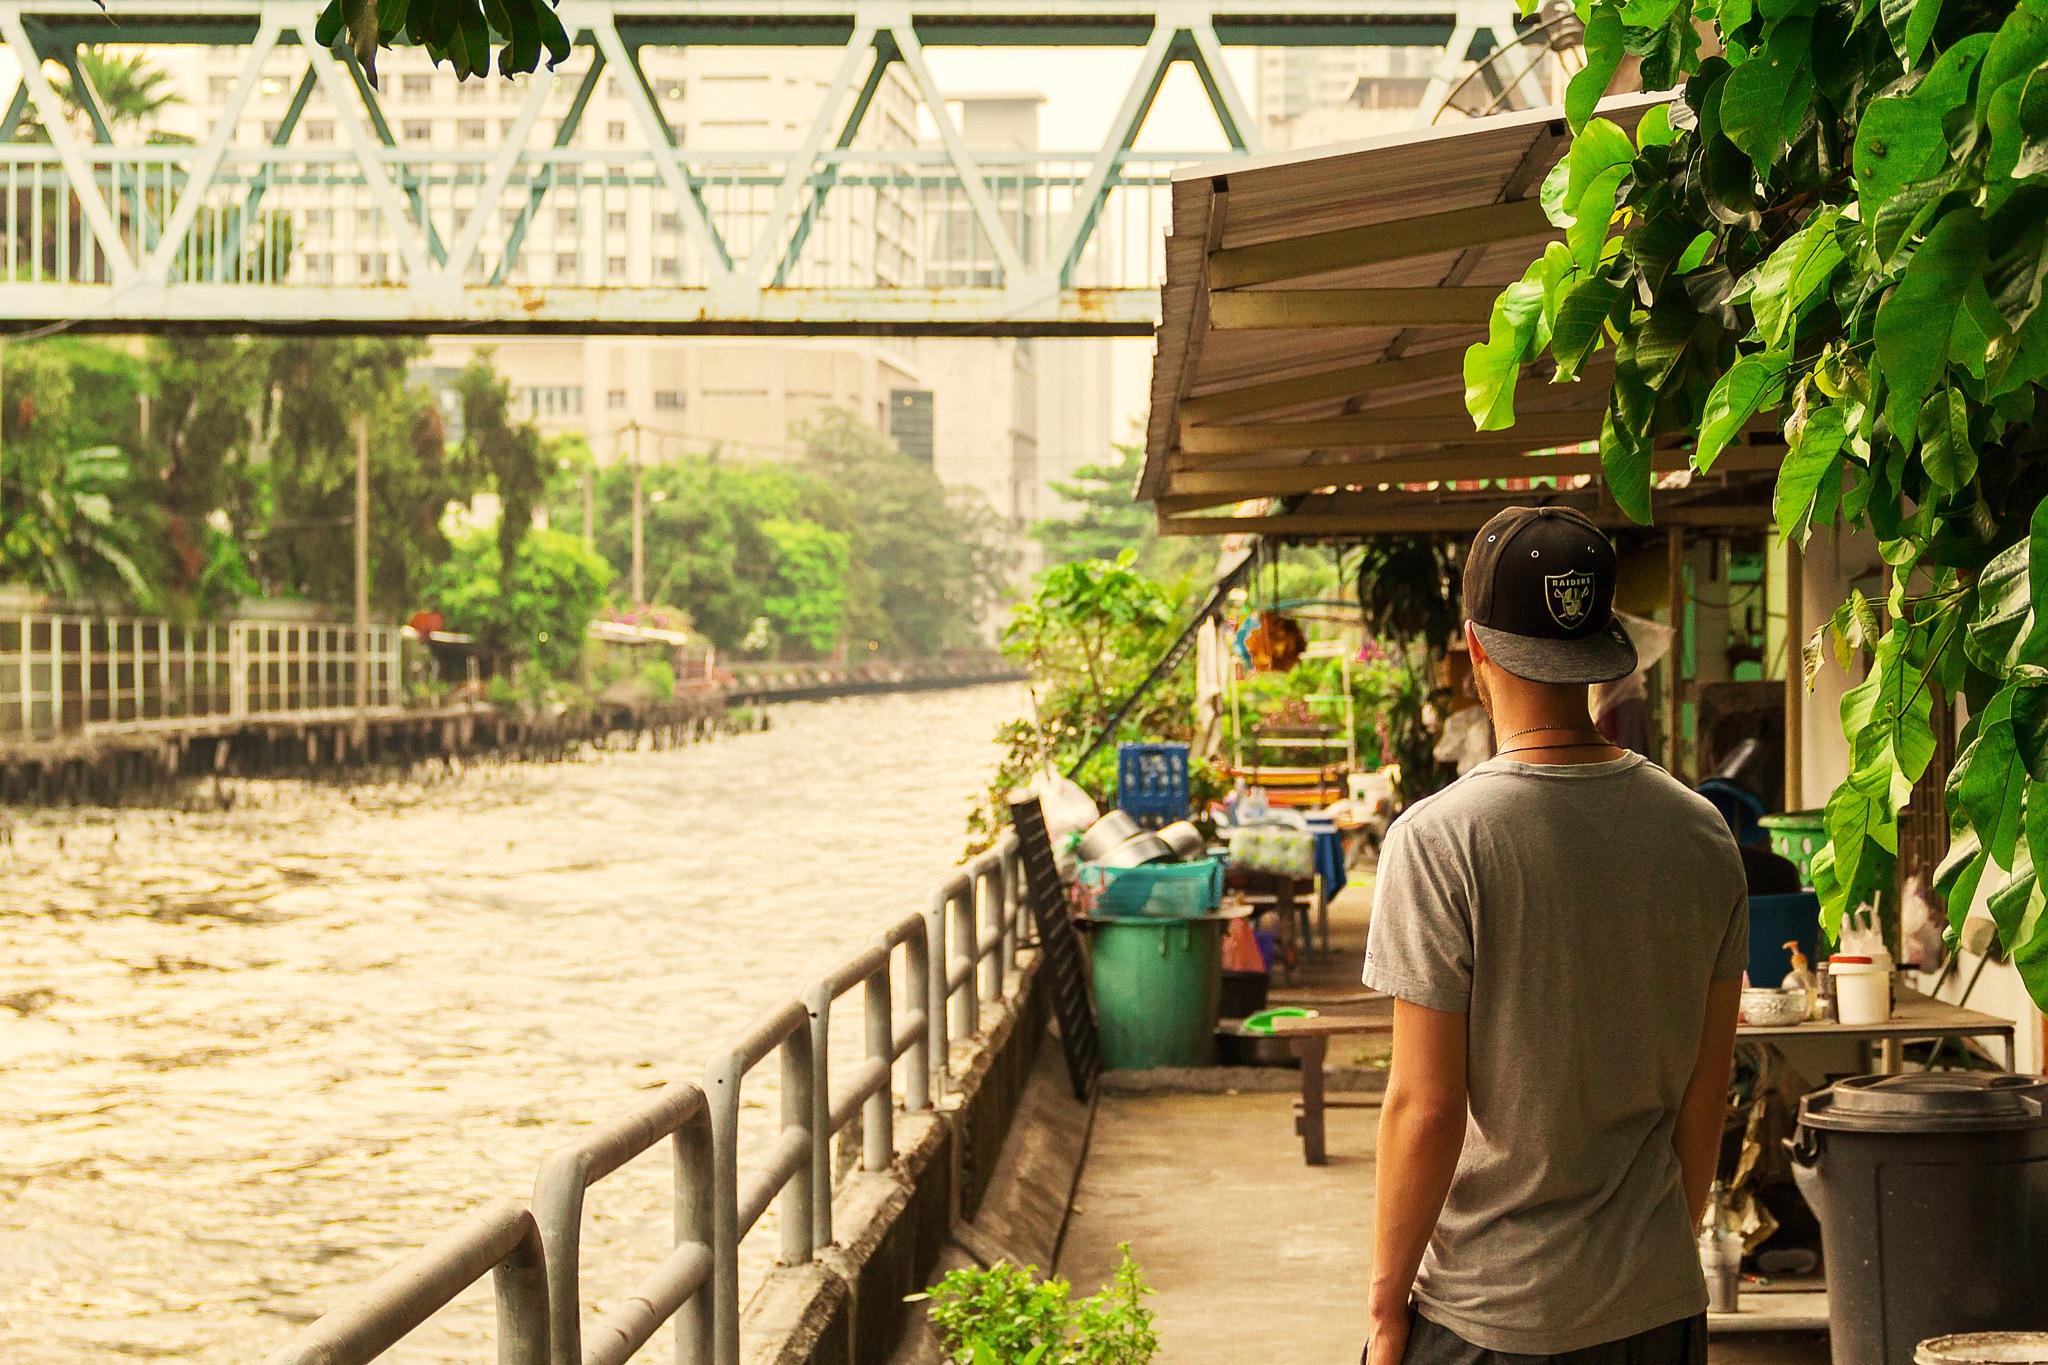 lost in bangkok by face_visual